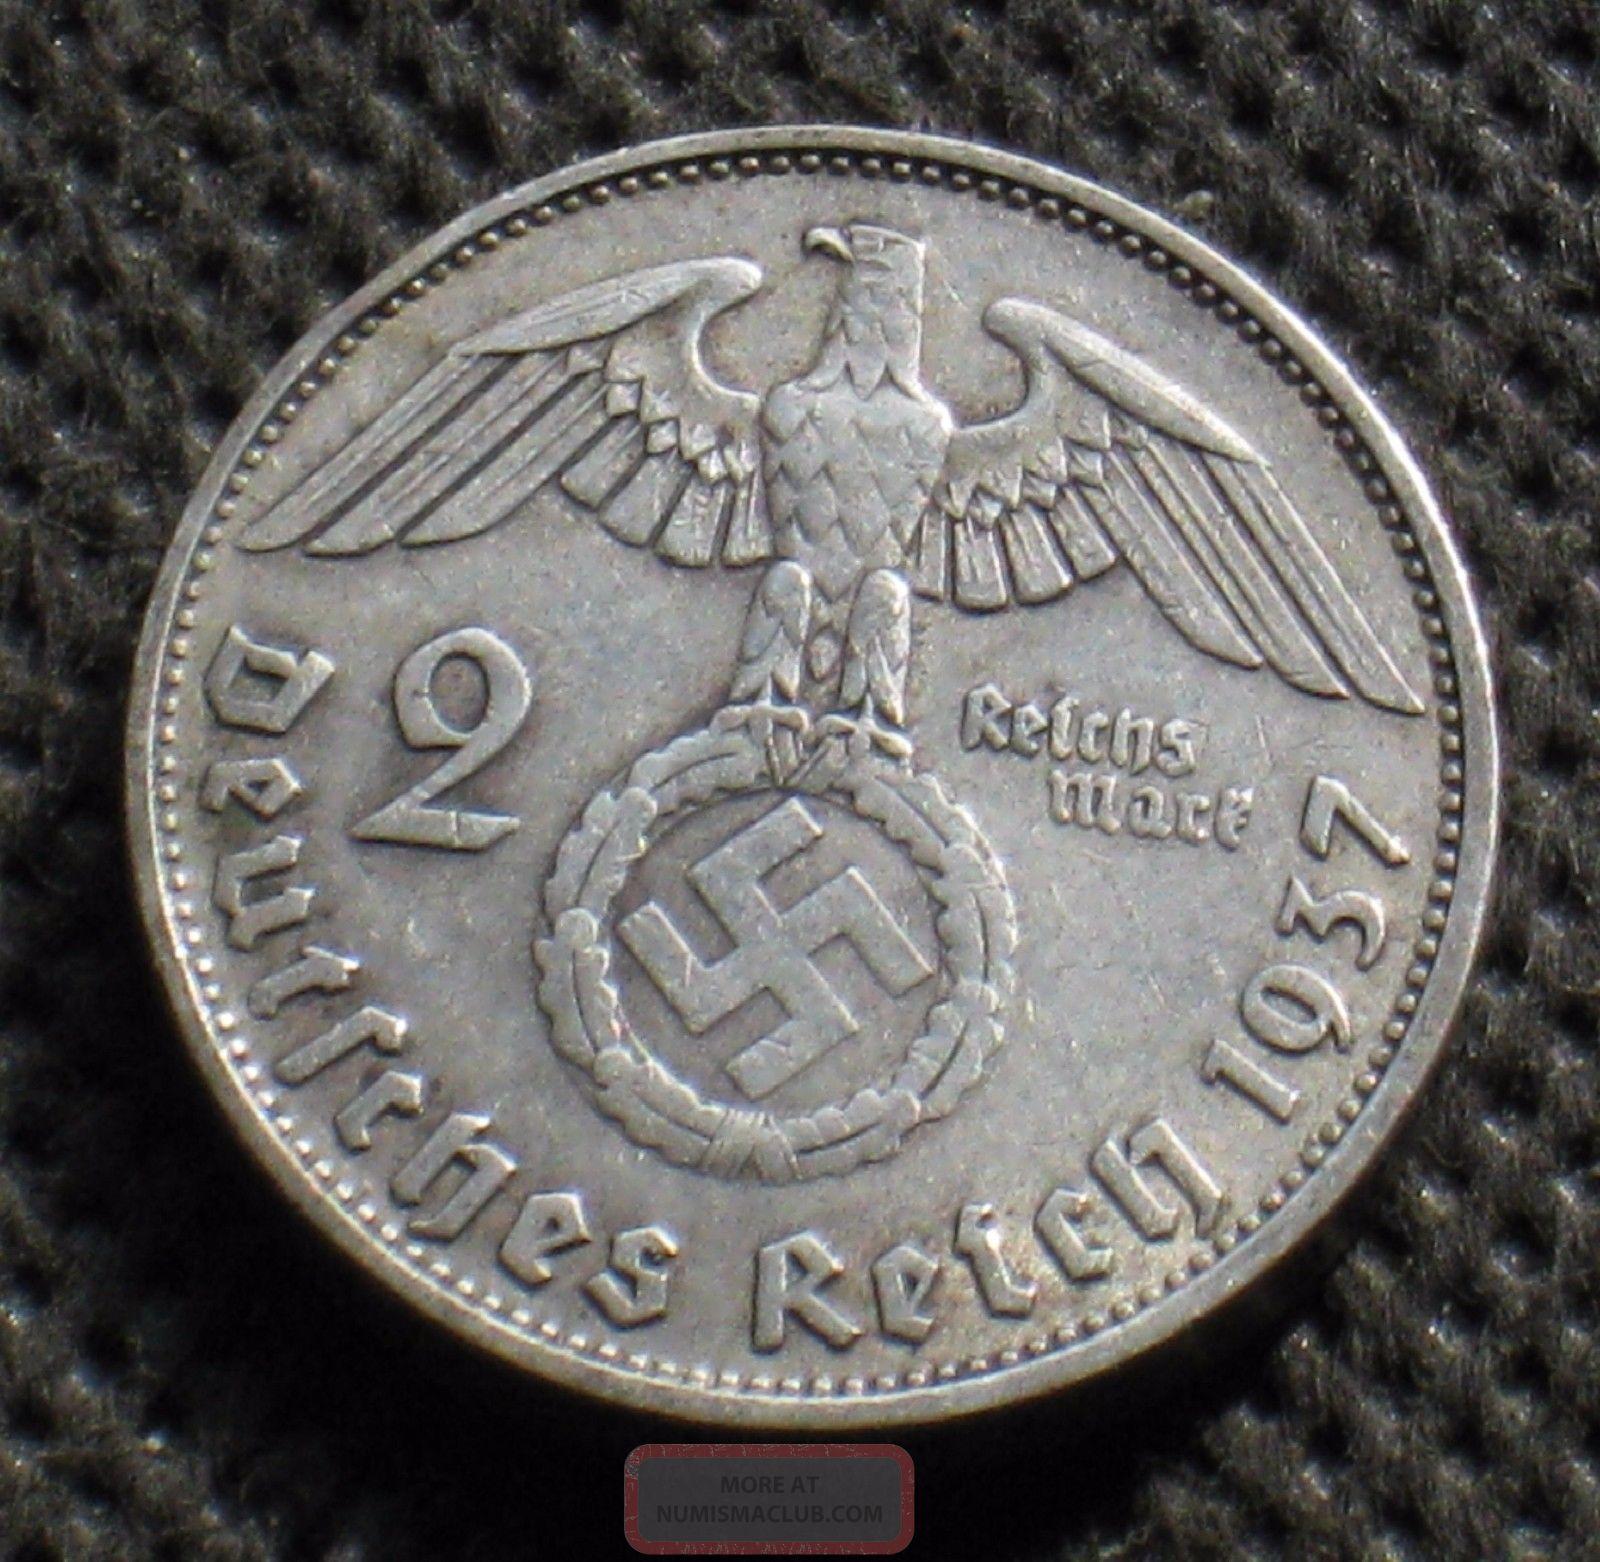 Old Silver 2 Reichsmark Coin Nazi Germany Swastika 1937 A Berlin World War Ii - 2 Germany photo